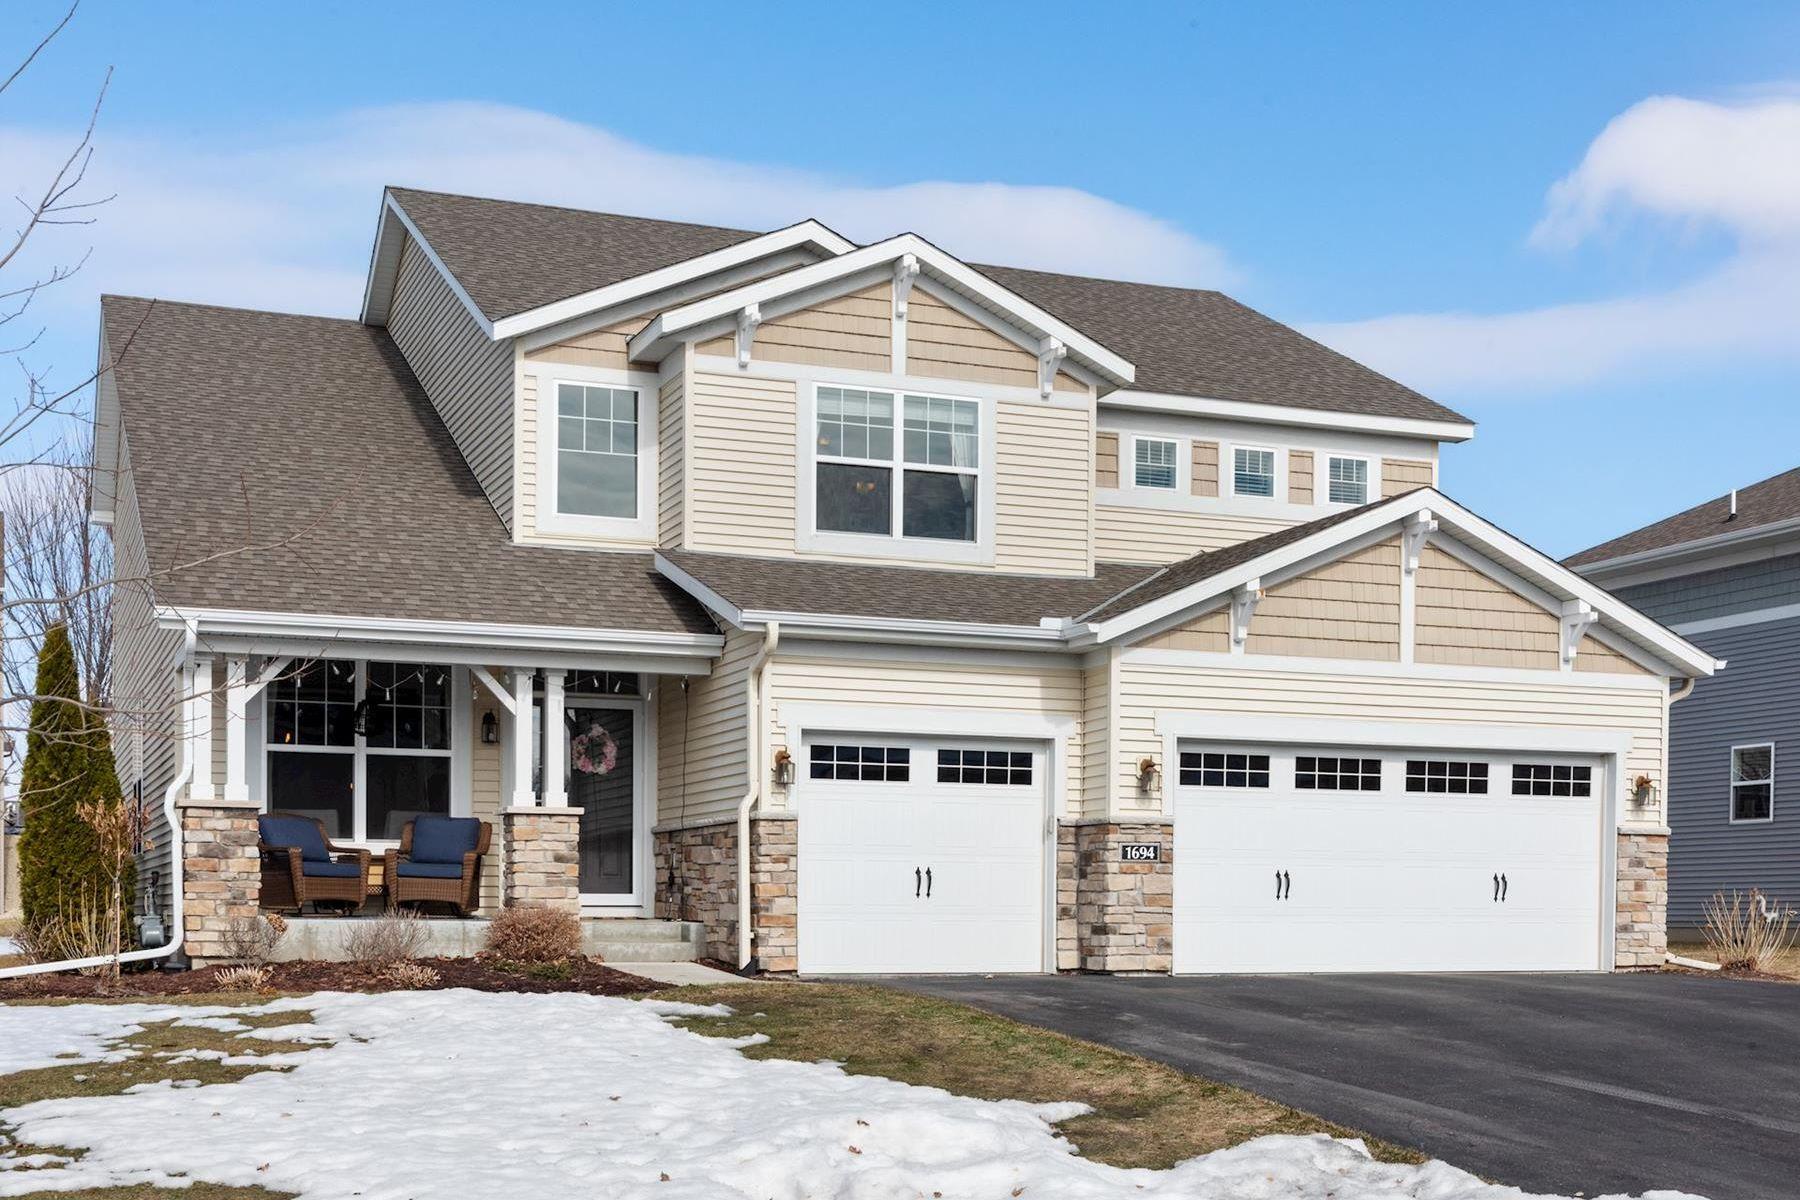 Single Family Homes für Verkauf beim Spectacular 5 Bedroom Turn Key Home in Chanhassen 1694 Hemlock Way, Chanhassen, Minnesota 55317 Vereinigte Staaten